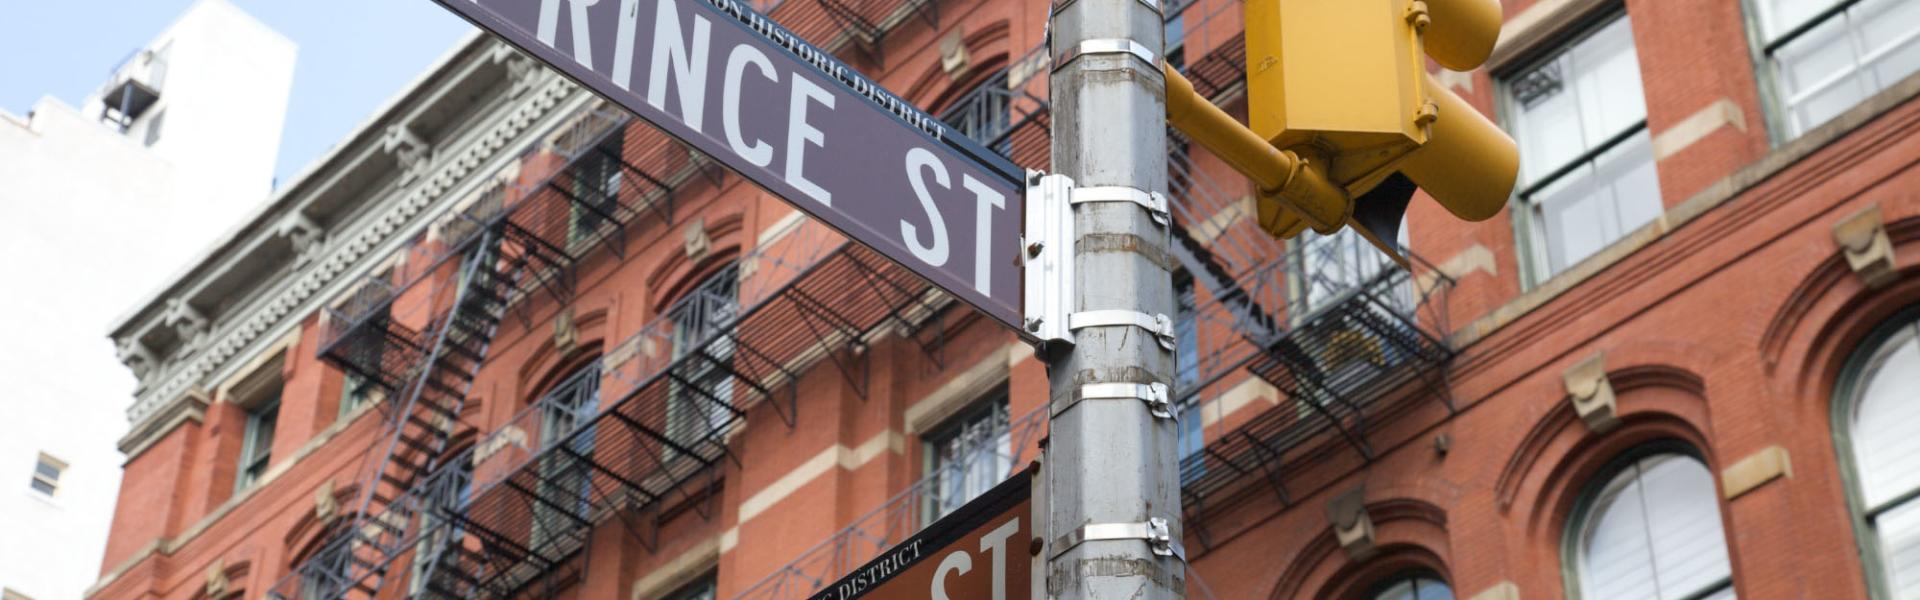 Prince Street, Mercer Street